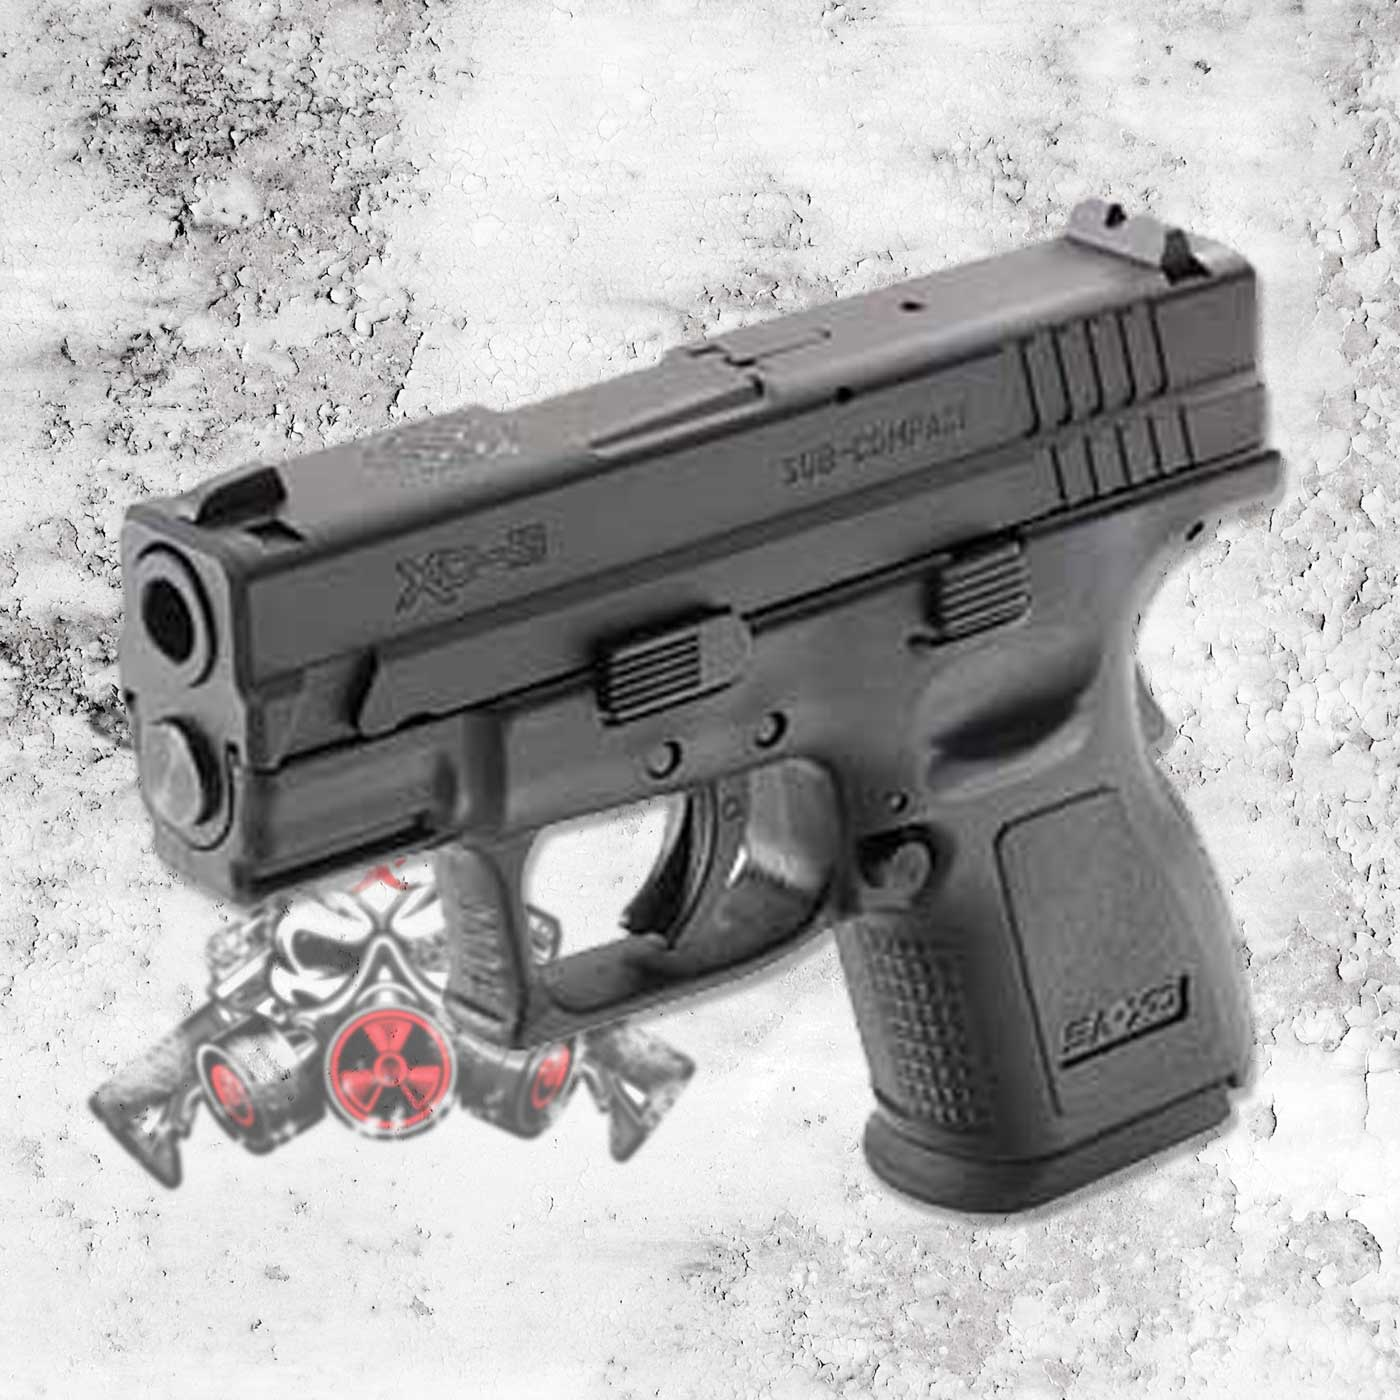 Springfield Xd9 9mm Pistol 3 U0026 39  U0026 39  Barrel Black  1  13rd Mag